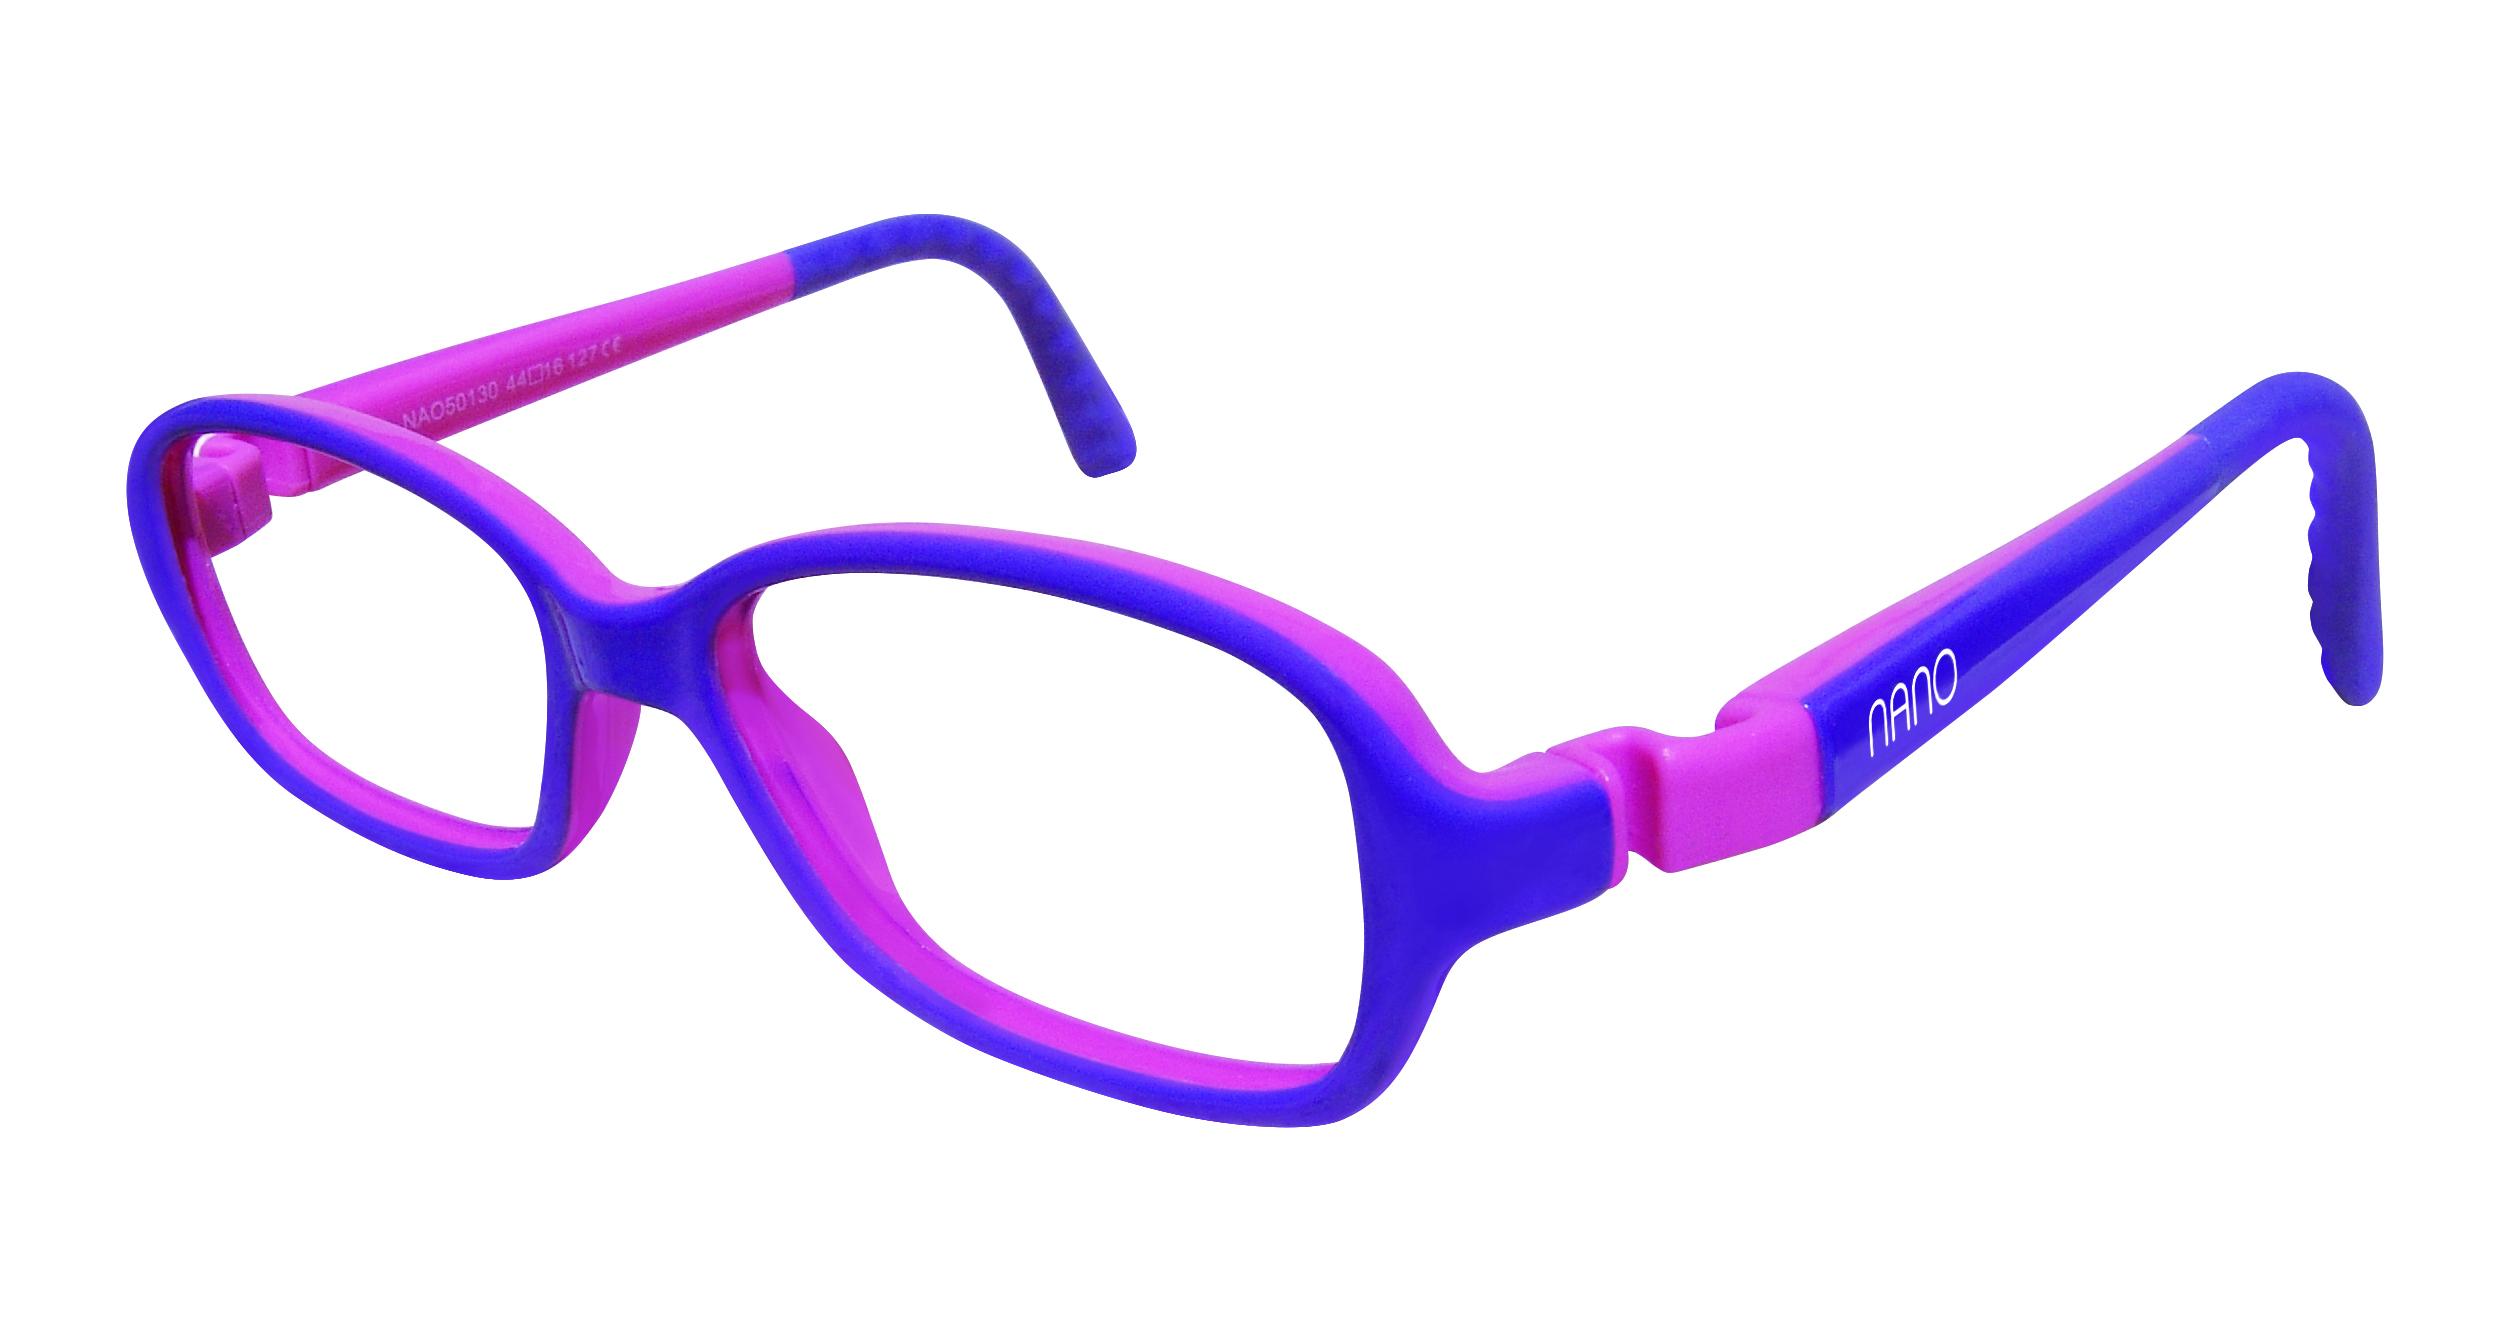 5744e0dbaa5 Eyewear for Kids - Pink Nano Vista - Optiwow